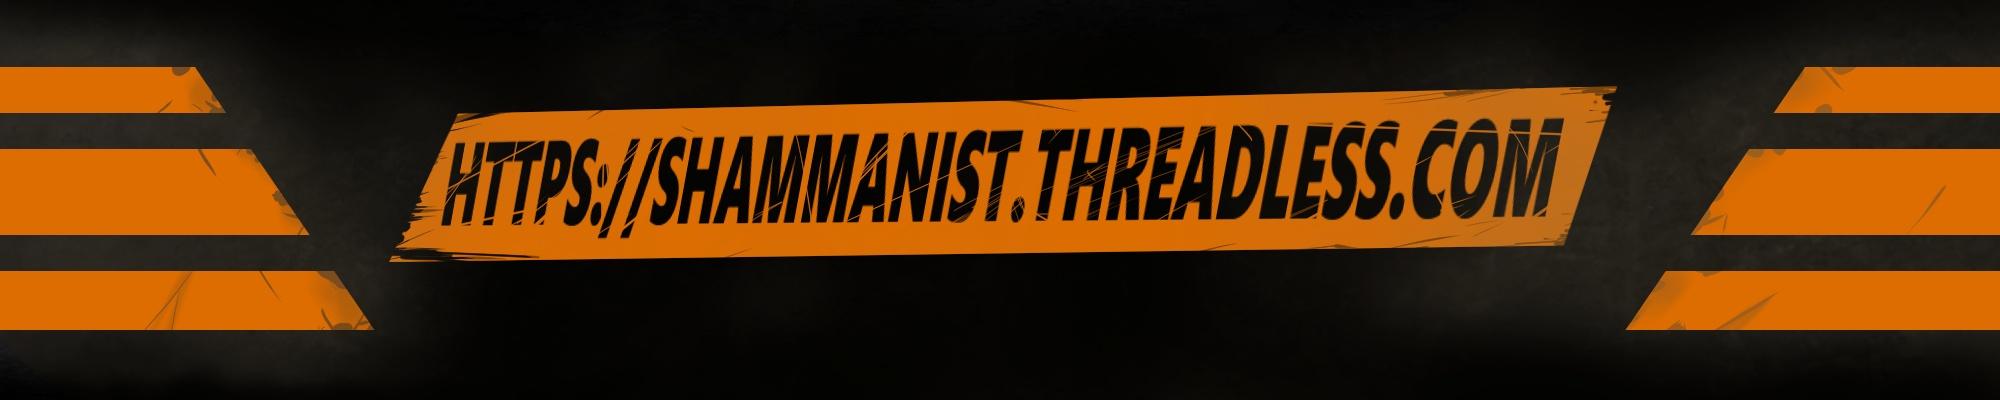 Shammanist Cover